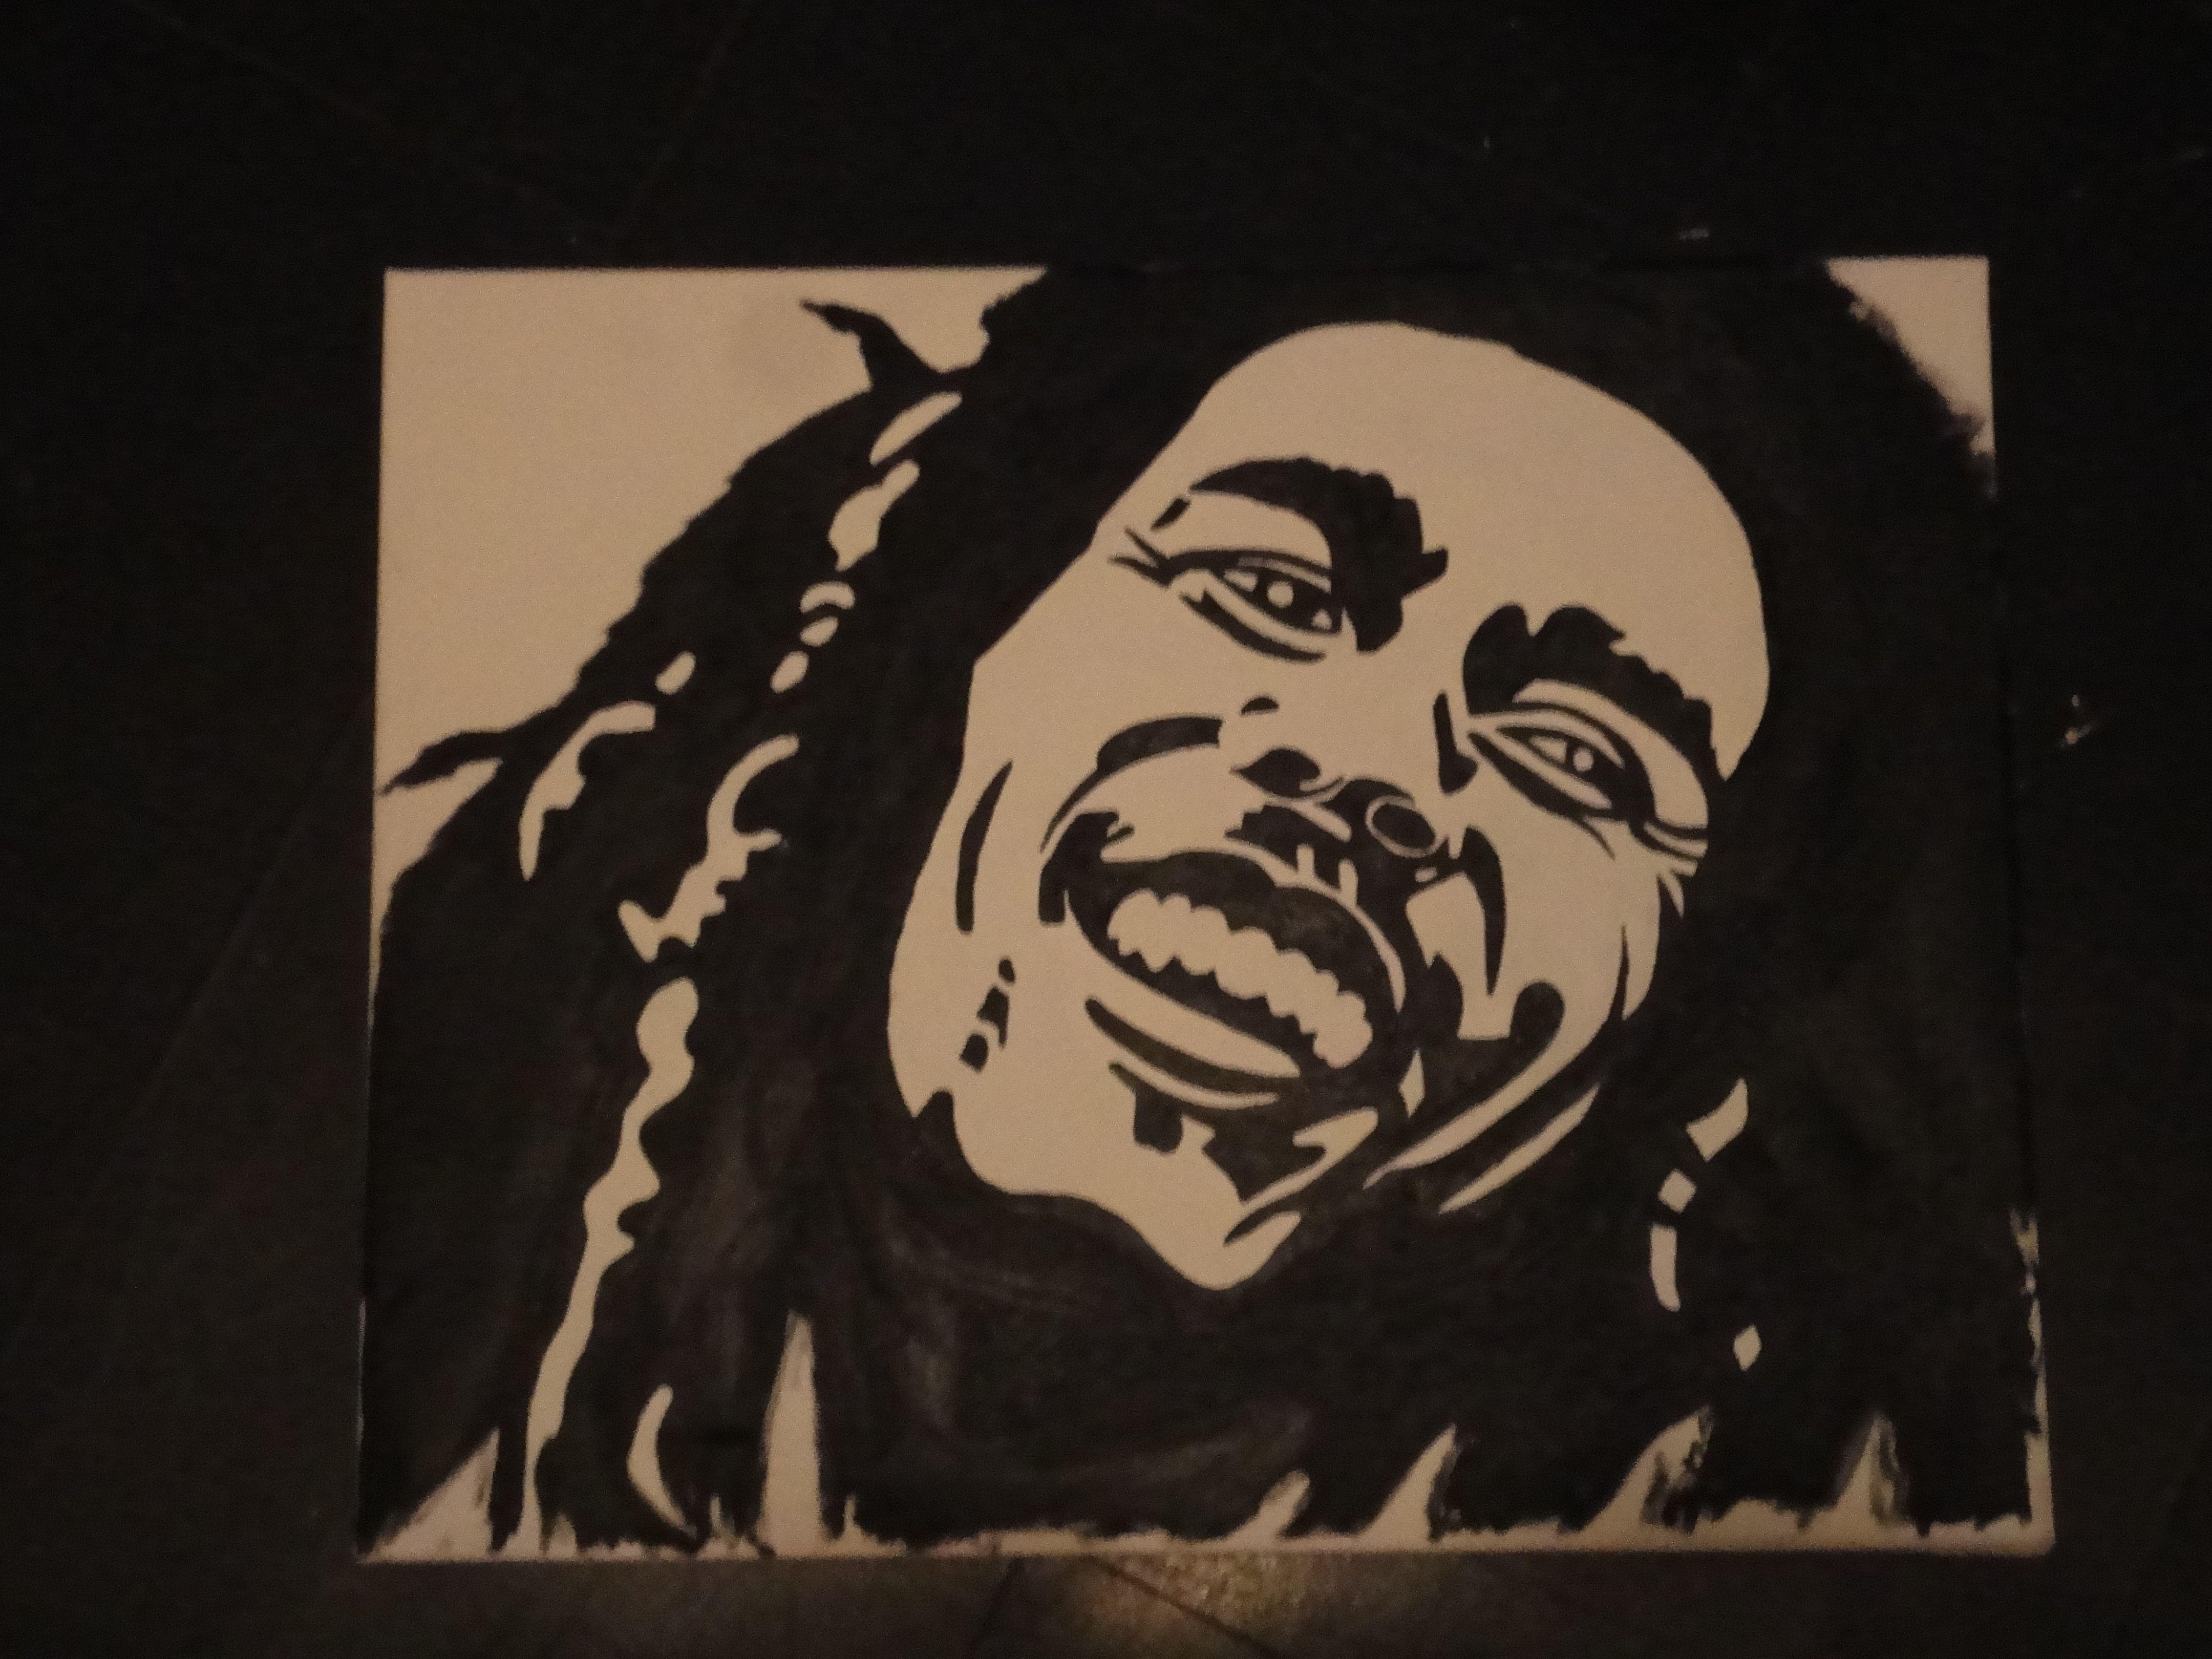 Bob Marley, olieverf schilderij op canvas